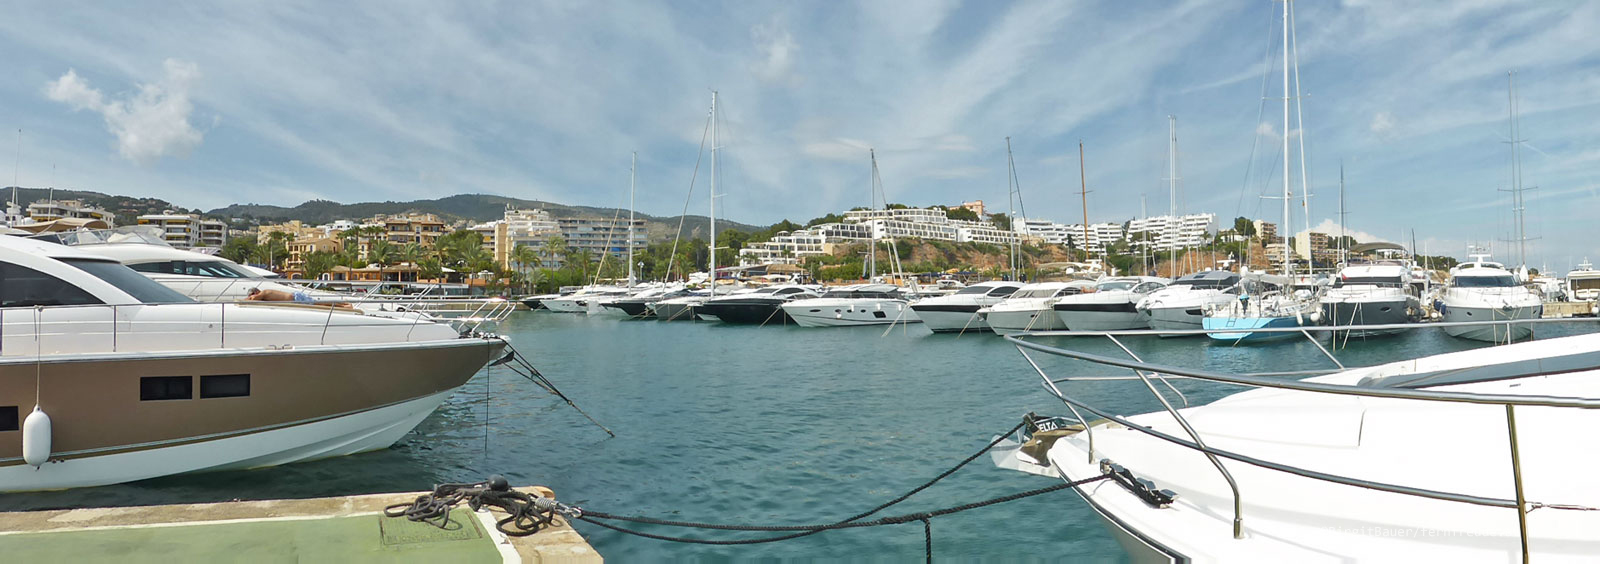 Mallorca037